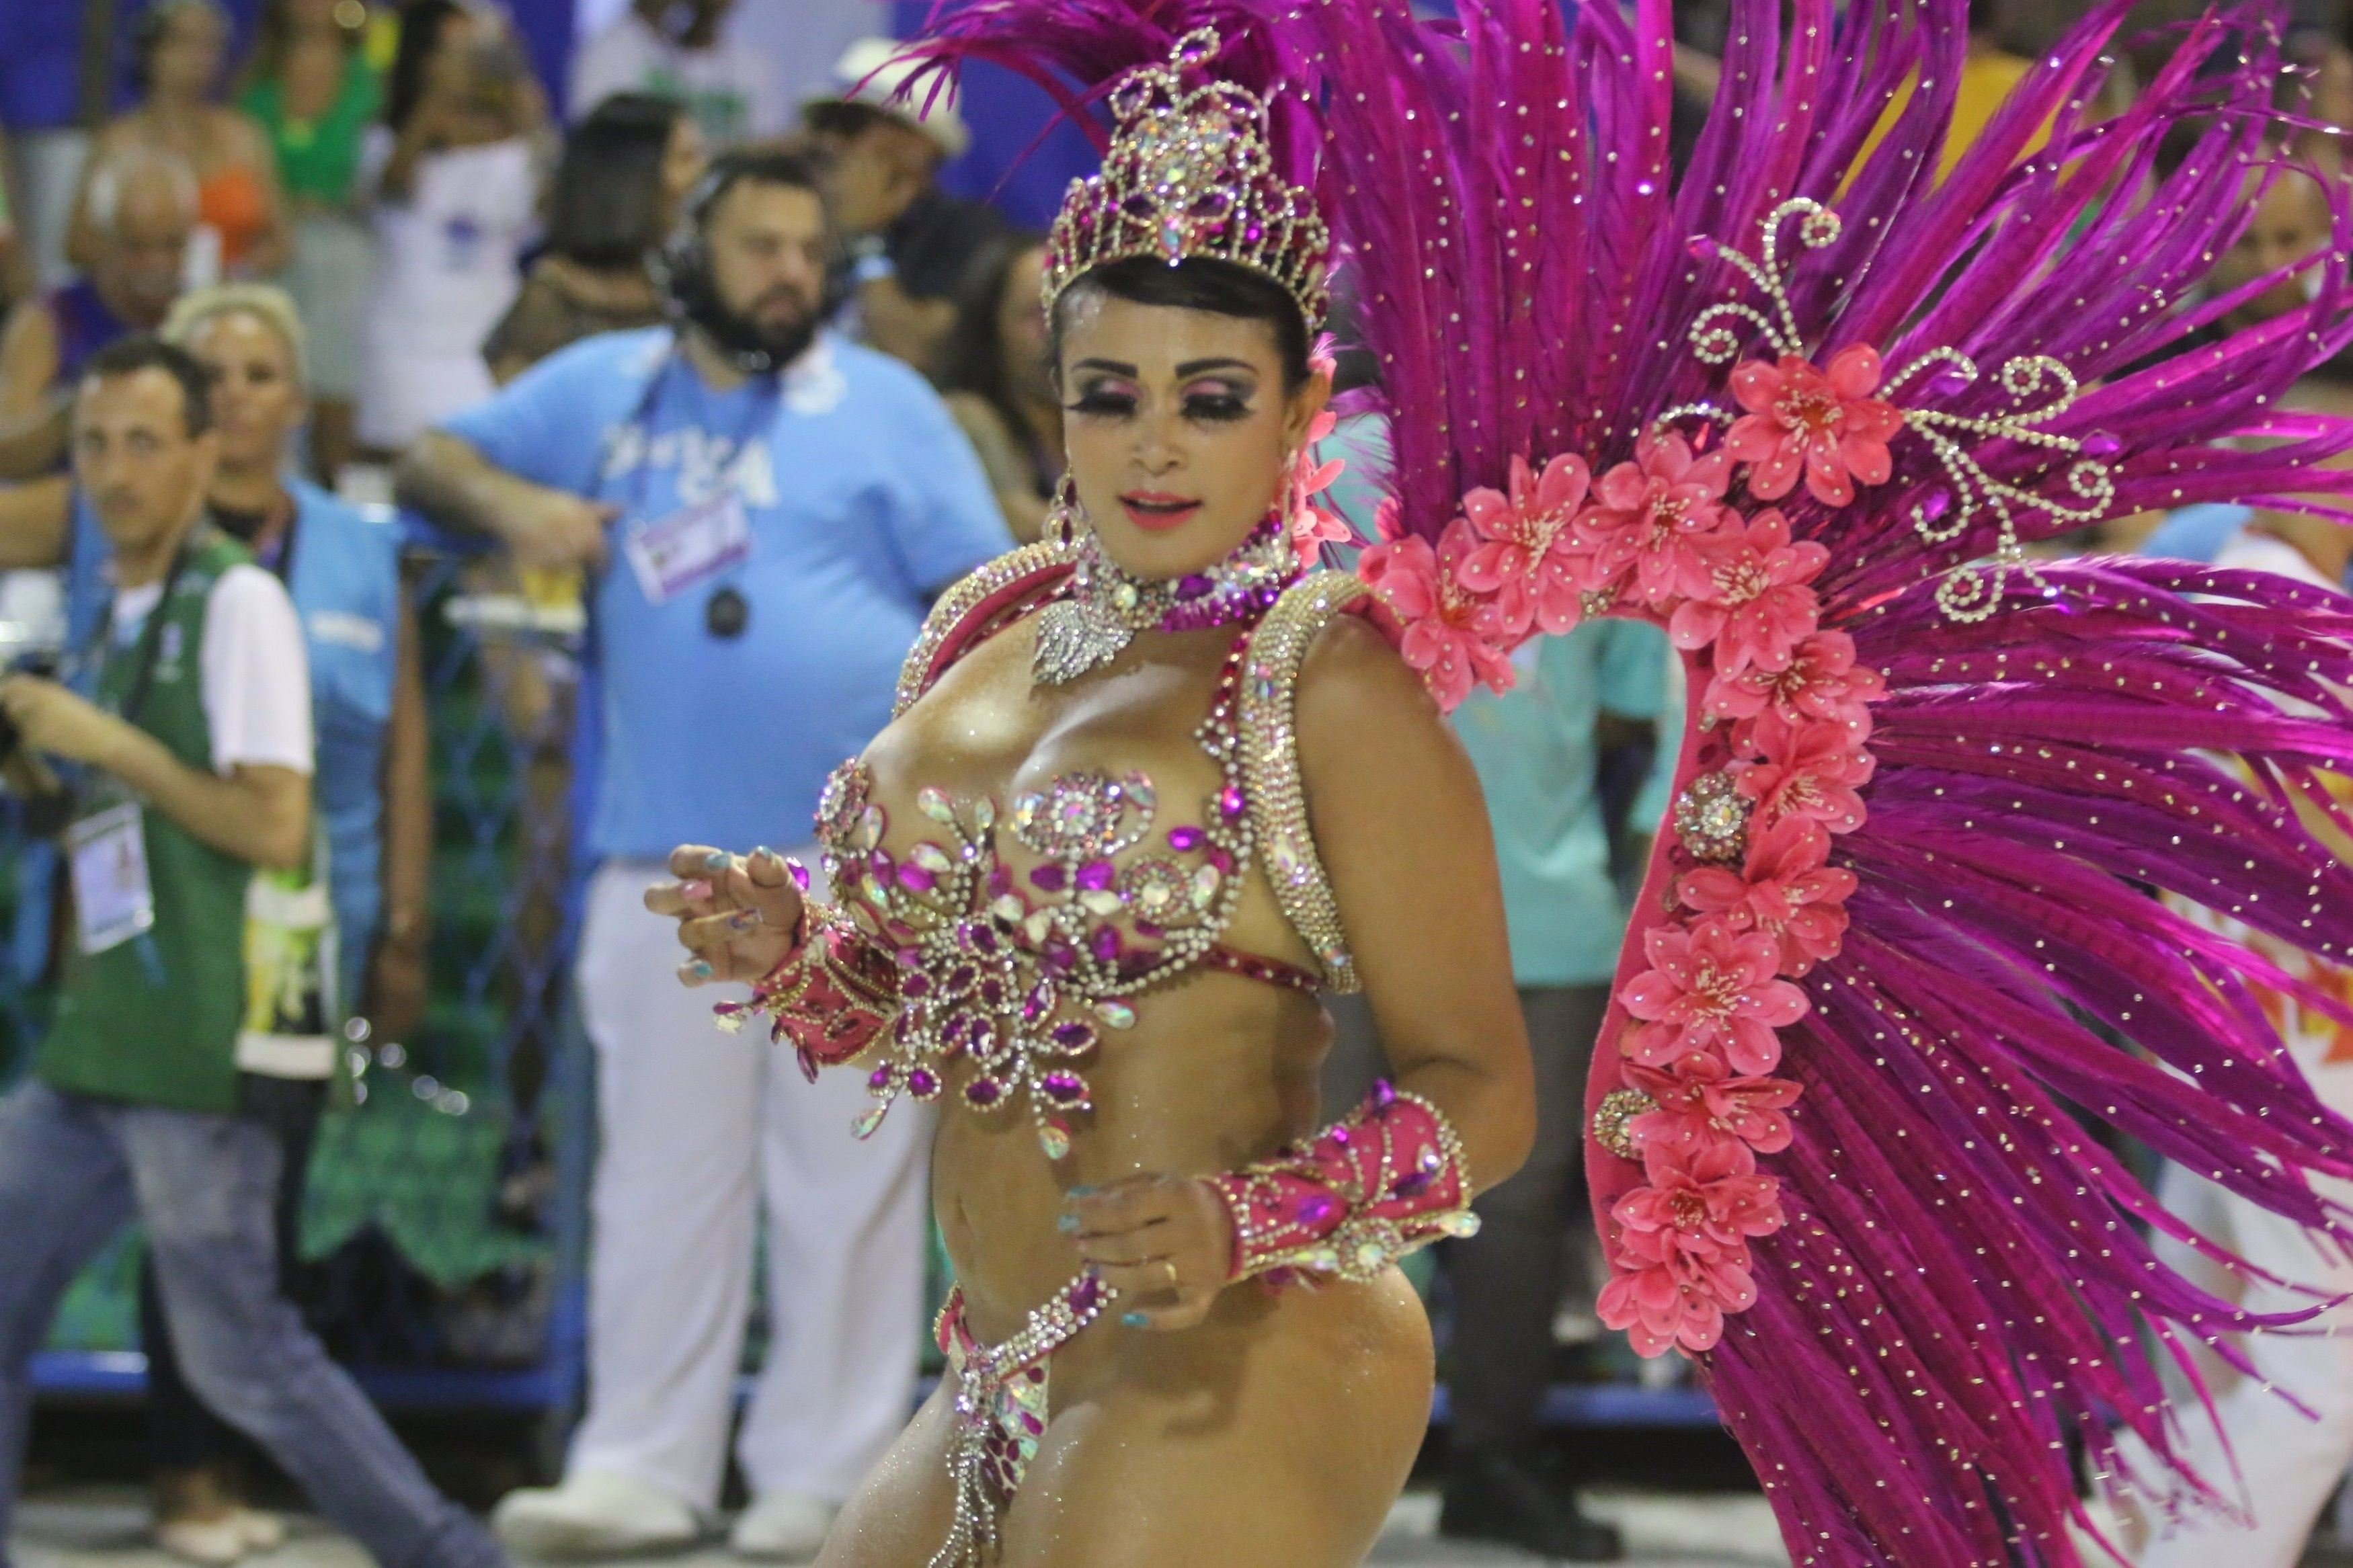 Carnavalul de la Rio: Defilarea şcolilor de samba